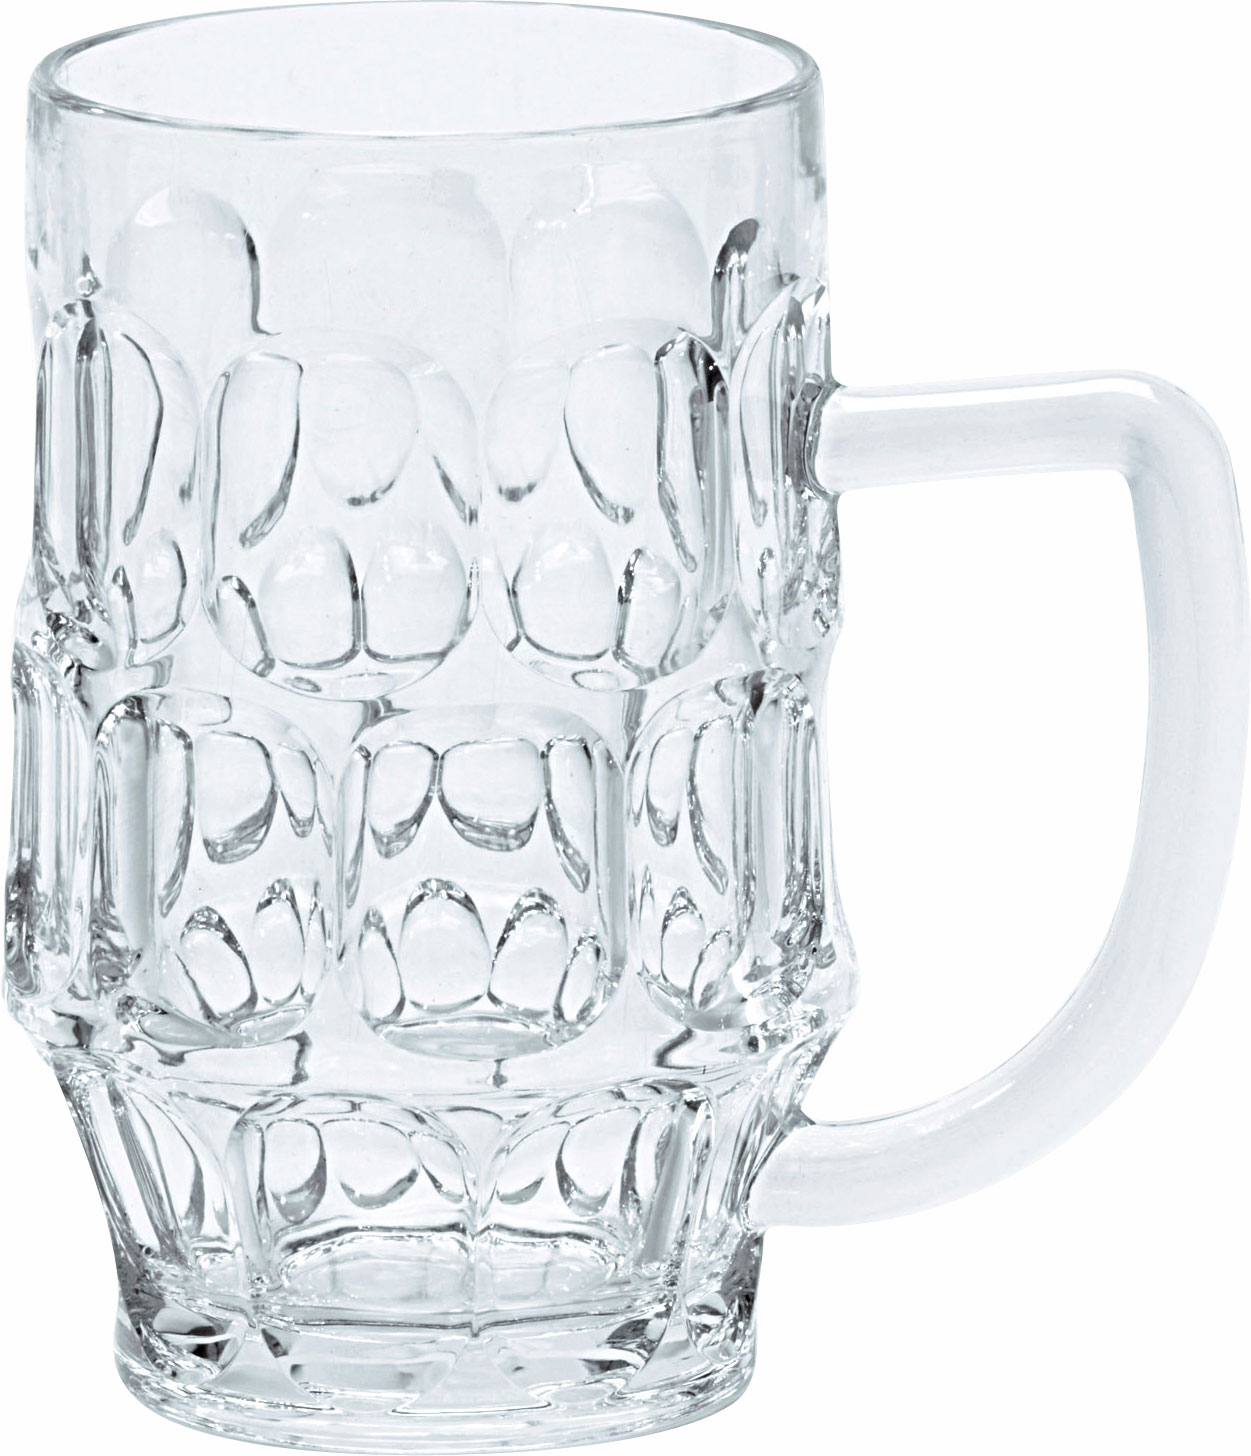 Gimex Kunststoff Bierkrug 0,5 l